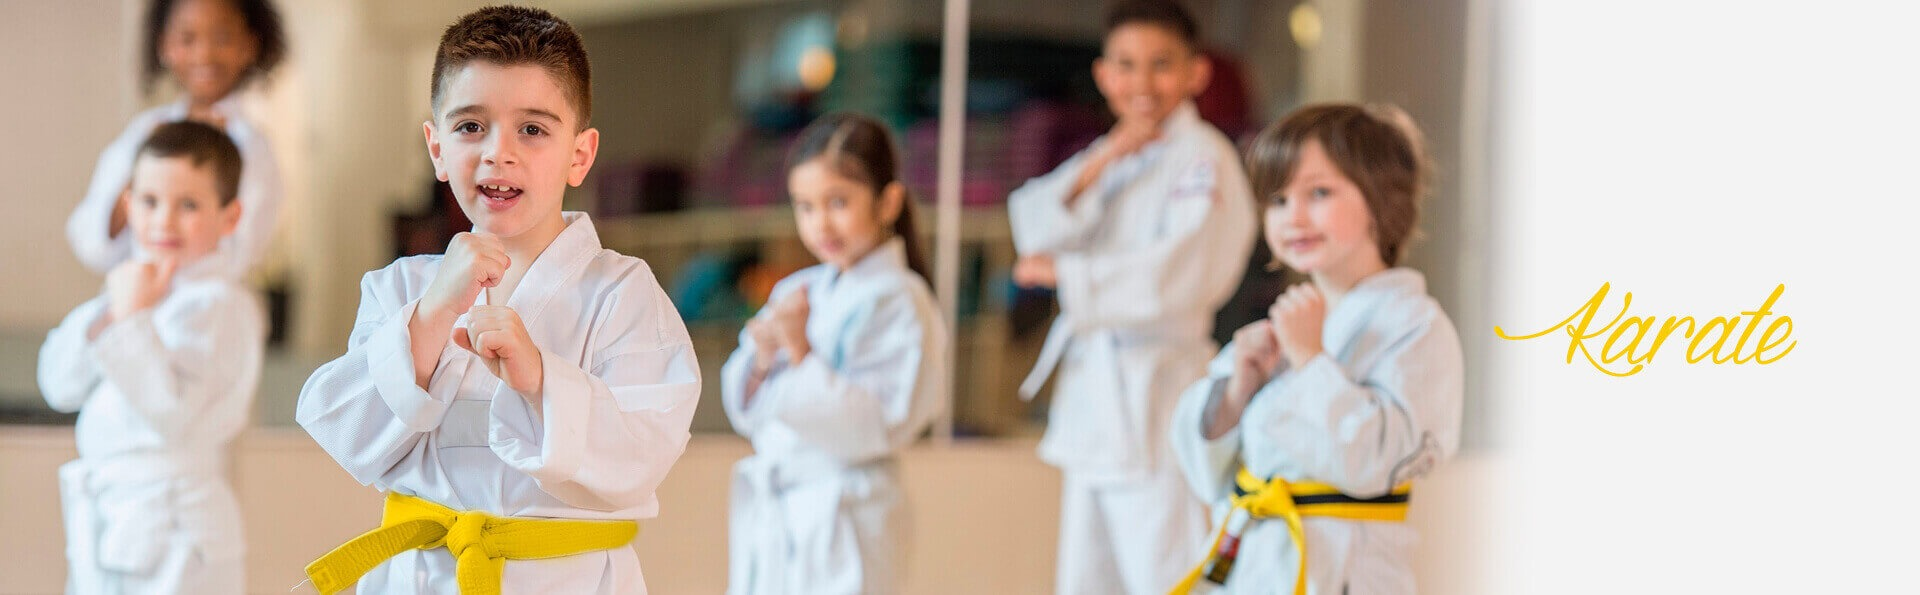 karate classes kids in dubai